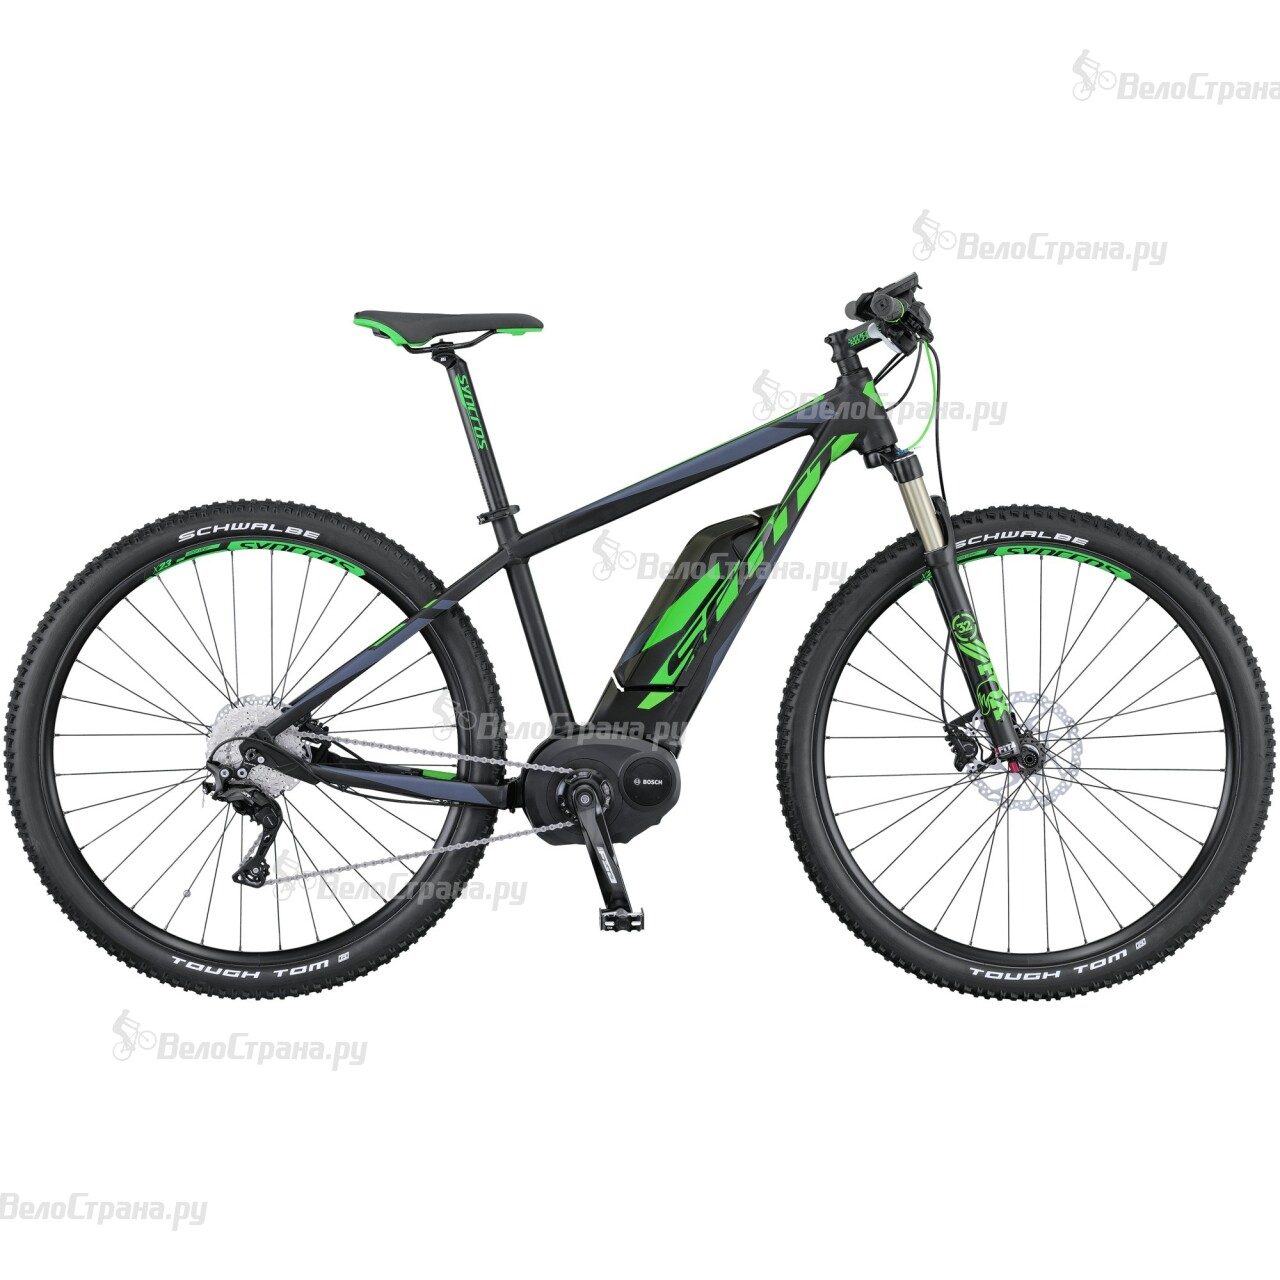 Велосипед Scott E-Aspect 910 (2016) велосипед scott aspect 950 29 2016